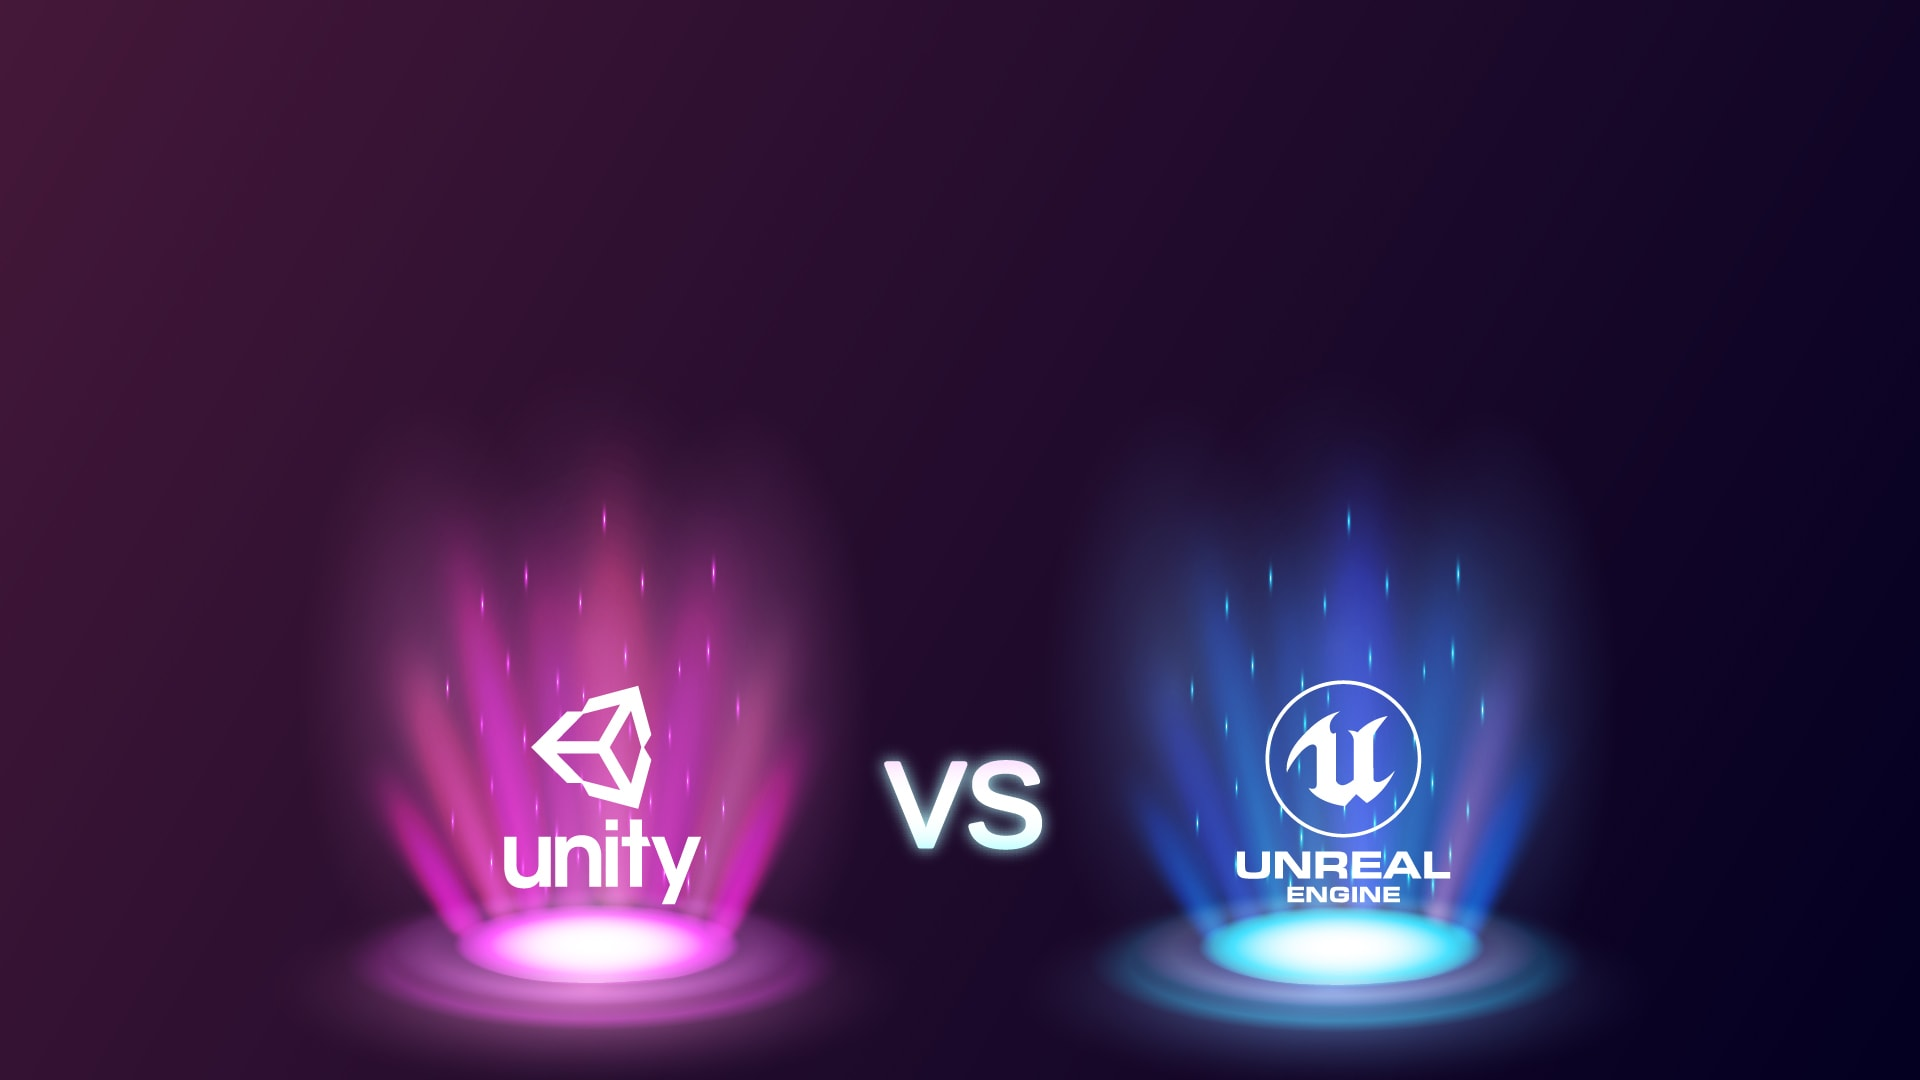 Unity vs Unreal Engine